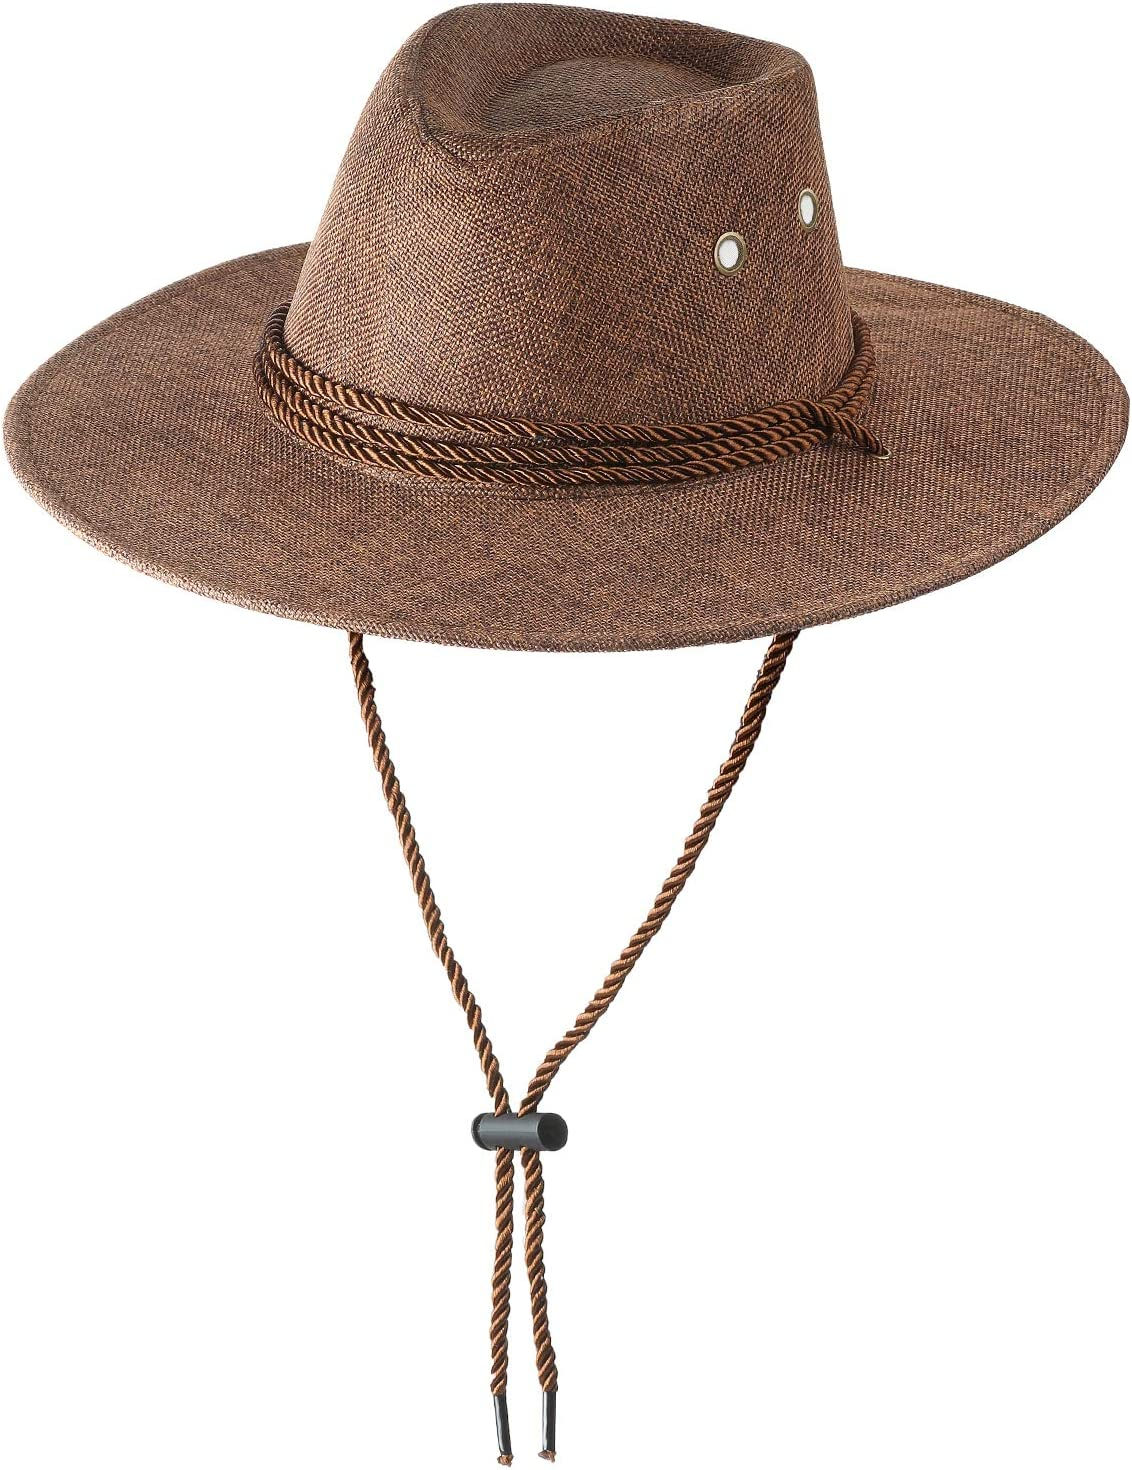 Beelittle Cowboy Kost/üm Zubeh/ör Cowboy Hut Bandanna Toy Guns mit G/ürtel Holster Cowboy Set f/ür Halloween Party Dress Up B